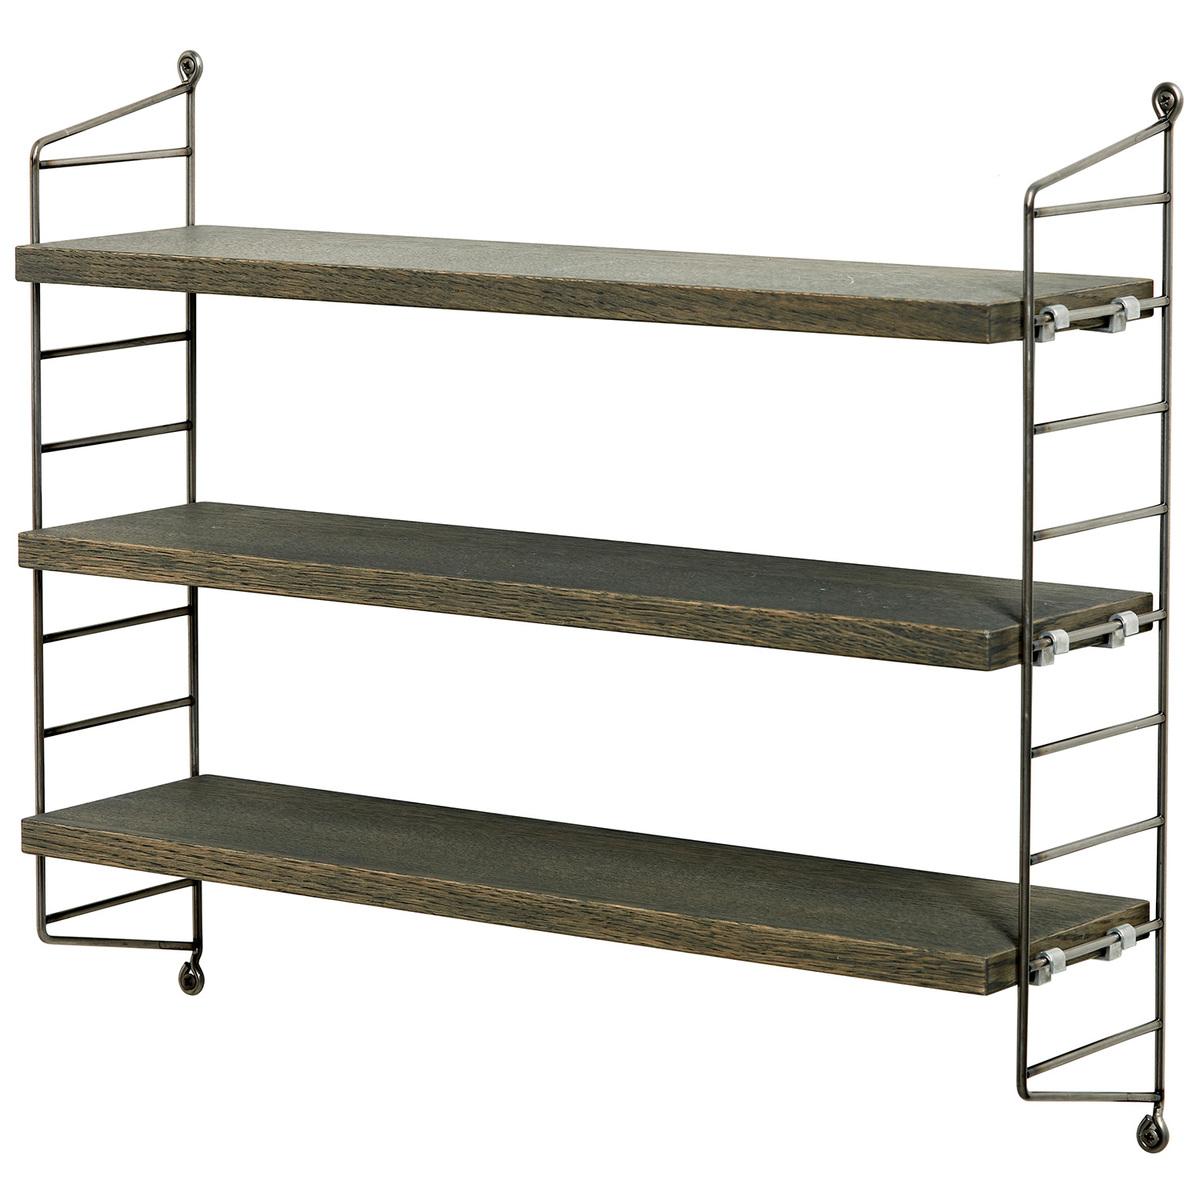 String Pocket Shelf Fds 15 Years Grey Oak Raw Metal